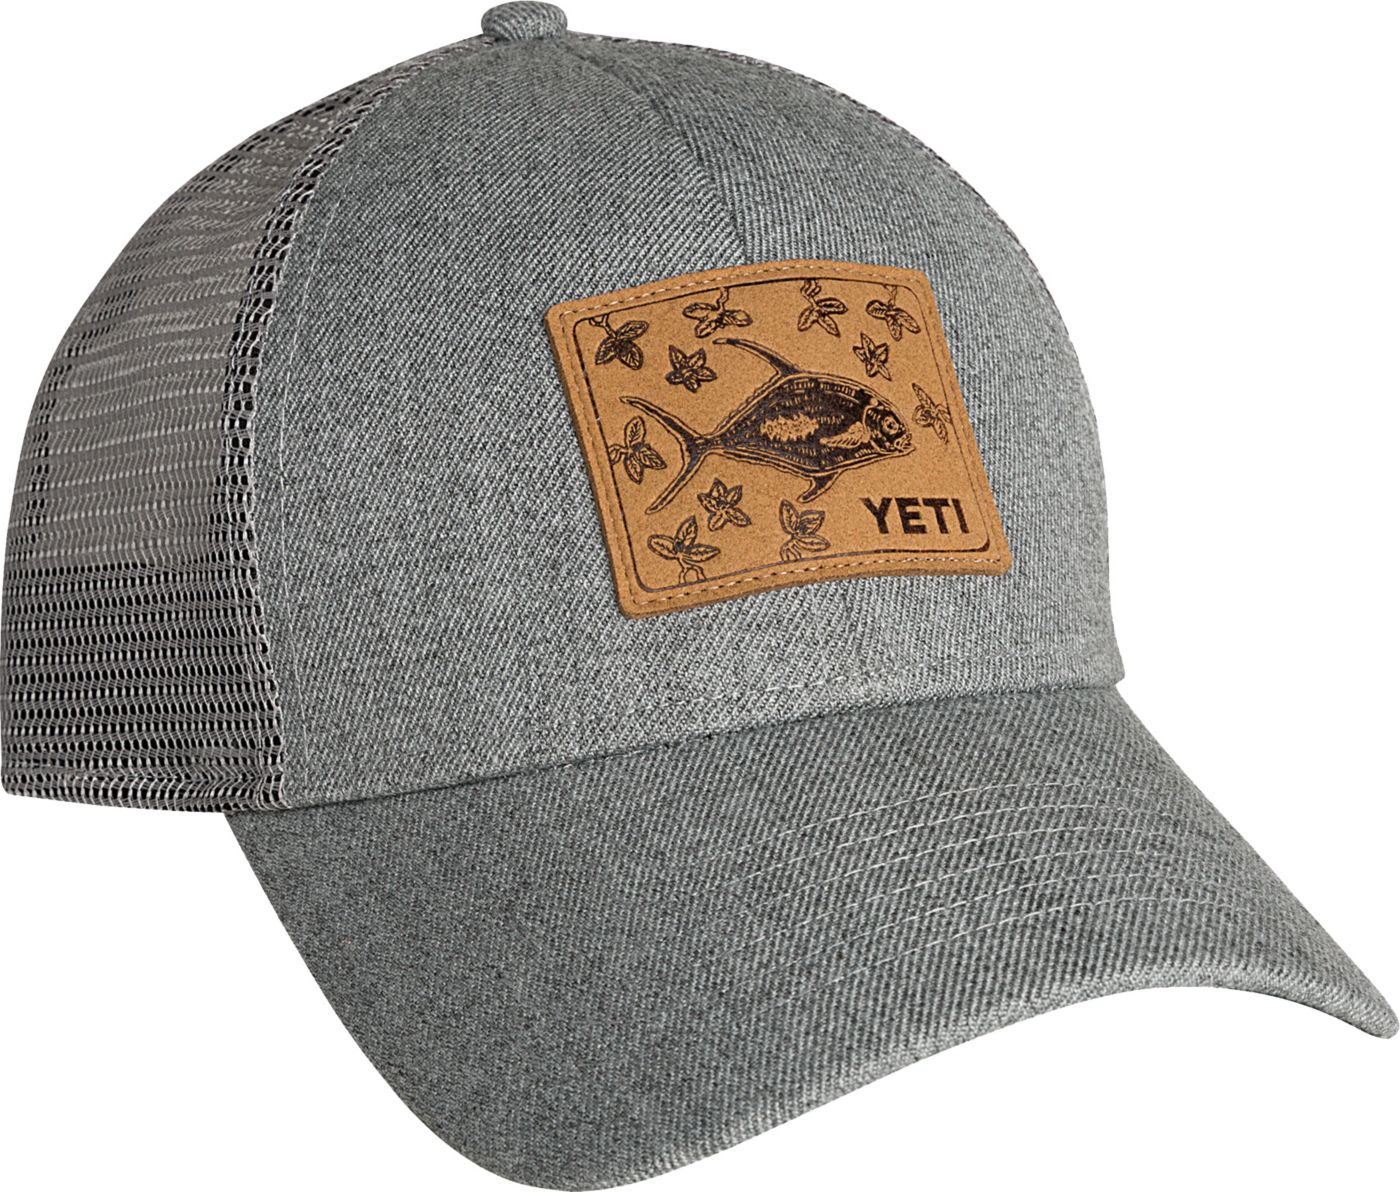 YETI Men's Permit In The Mangroves Patch Trucker Cap